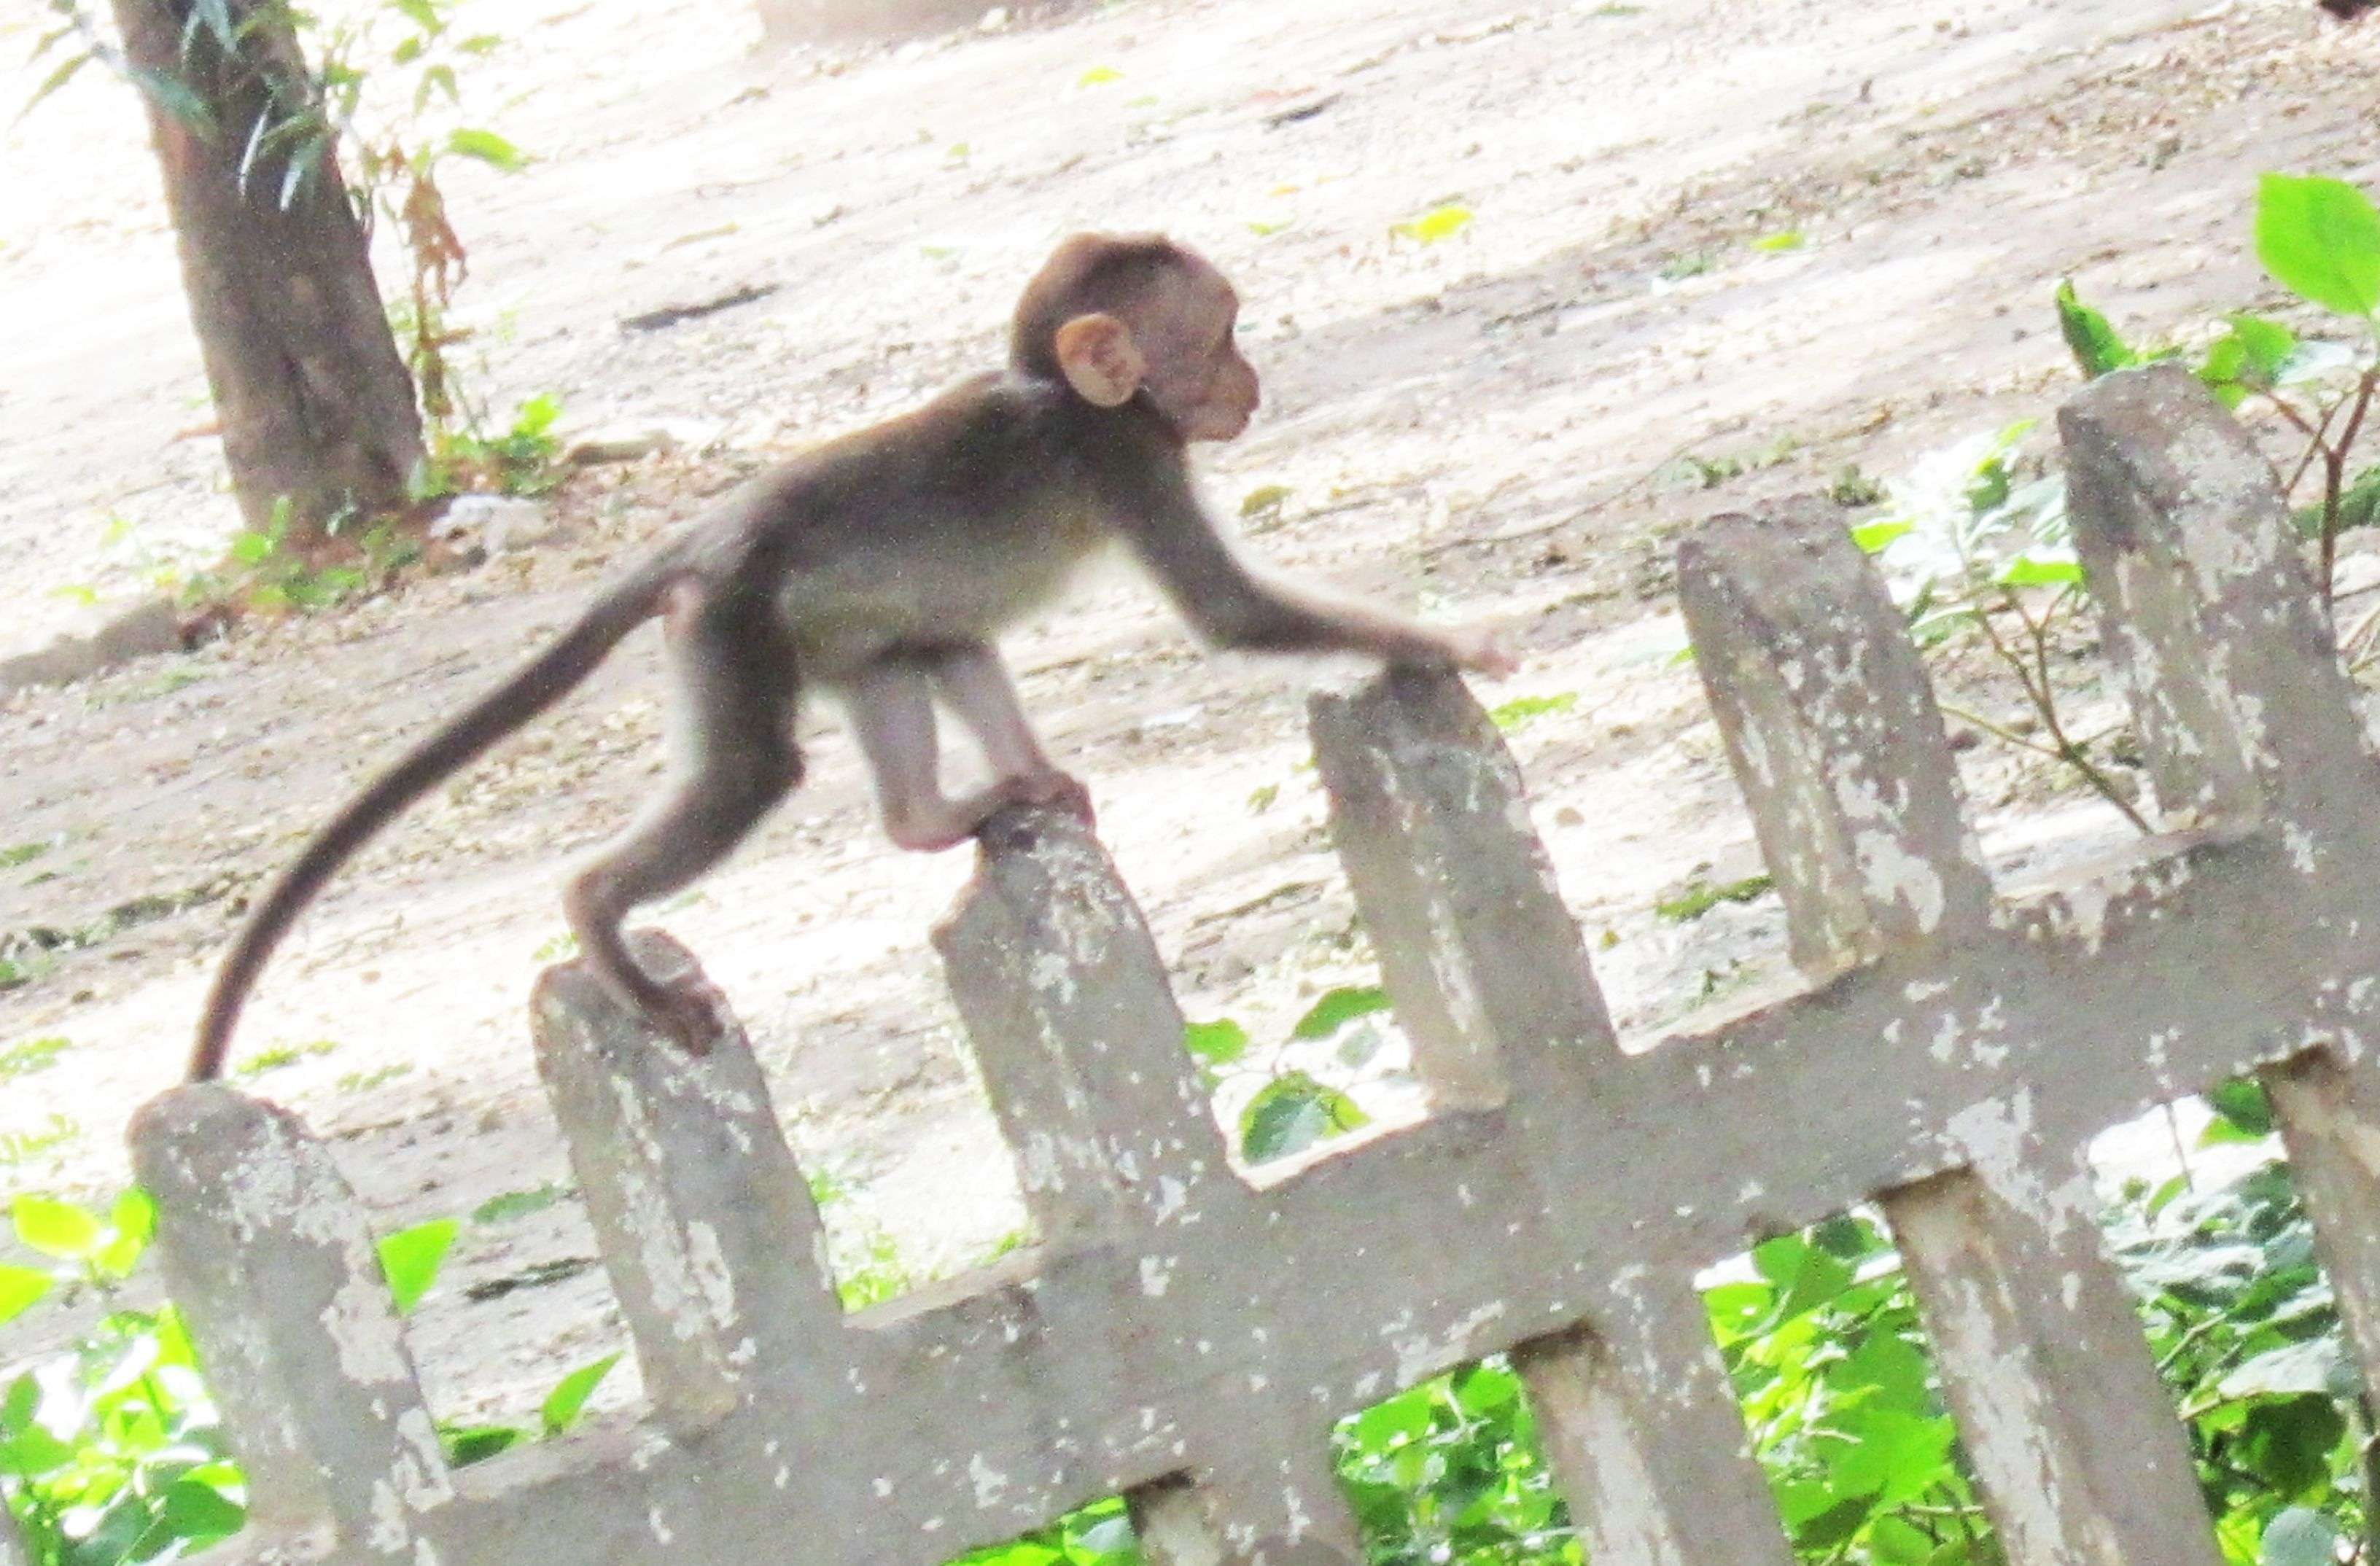 monkey,baby,balance,critters,camera,animal,mammal,ape,primate,lemur,saturday,pravin,phenomenon,pm,throo da looking glass,bangalore blog